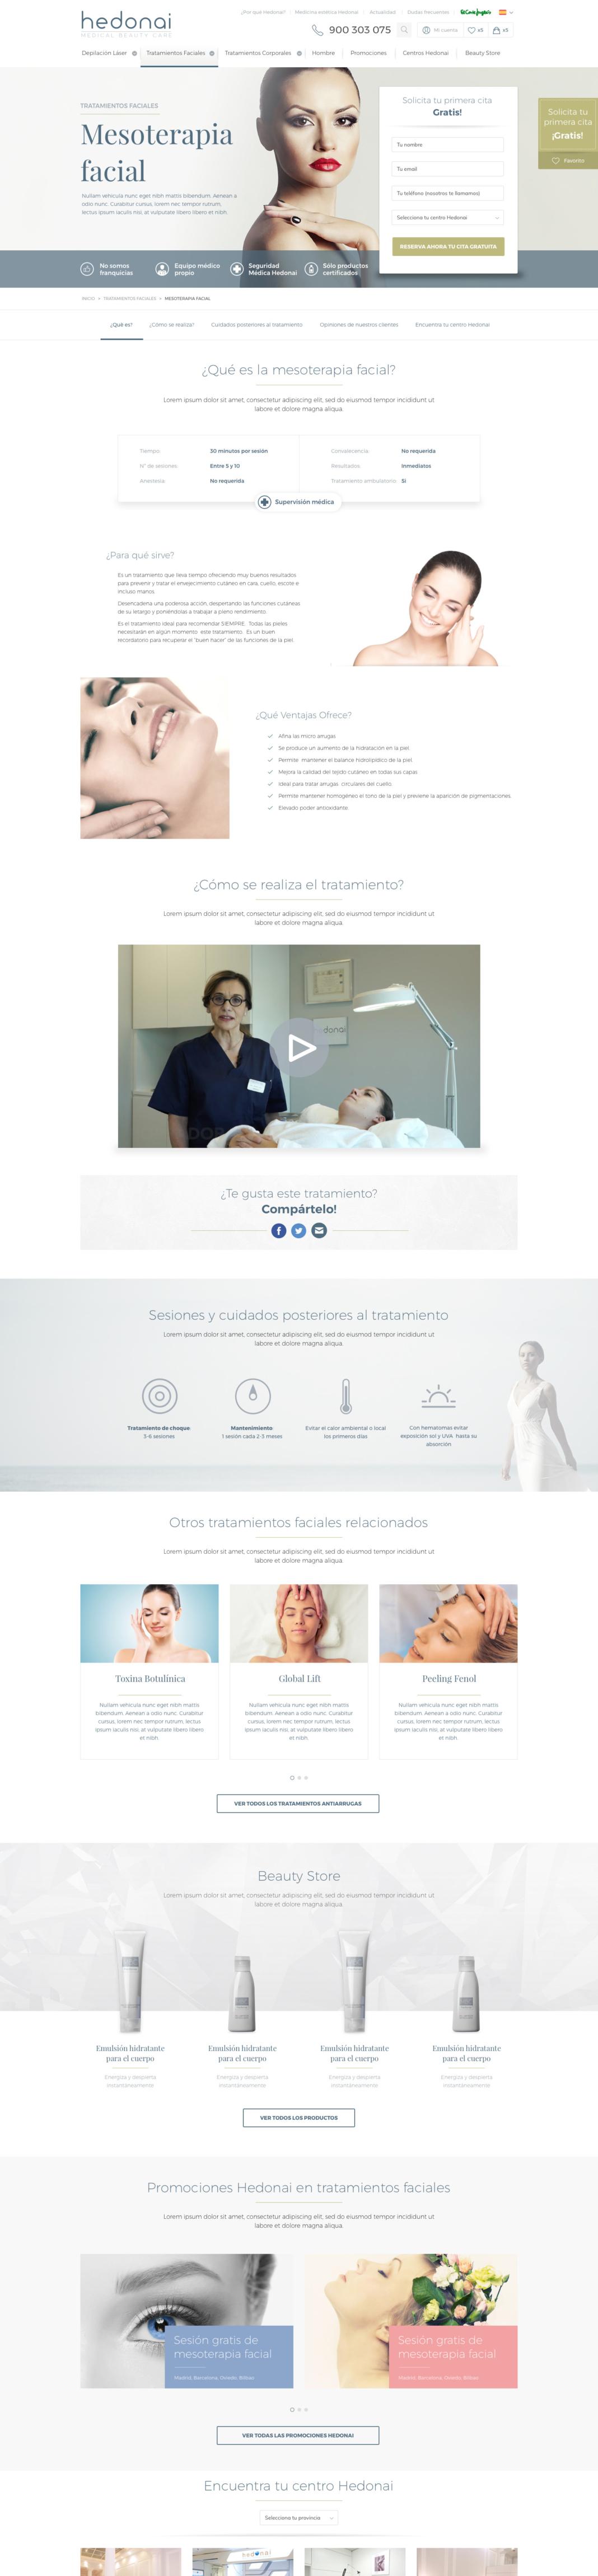 diseño web hedonai - tratamiento